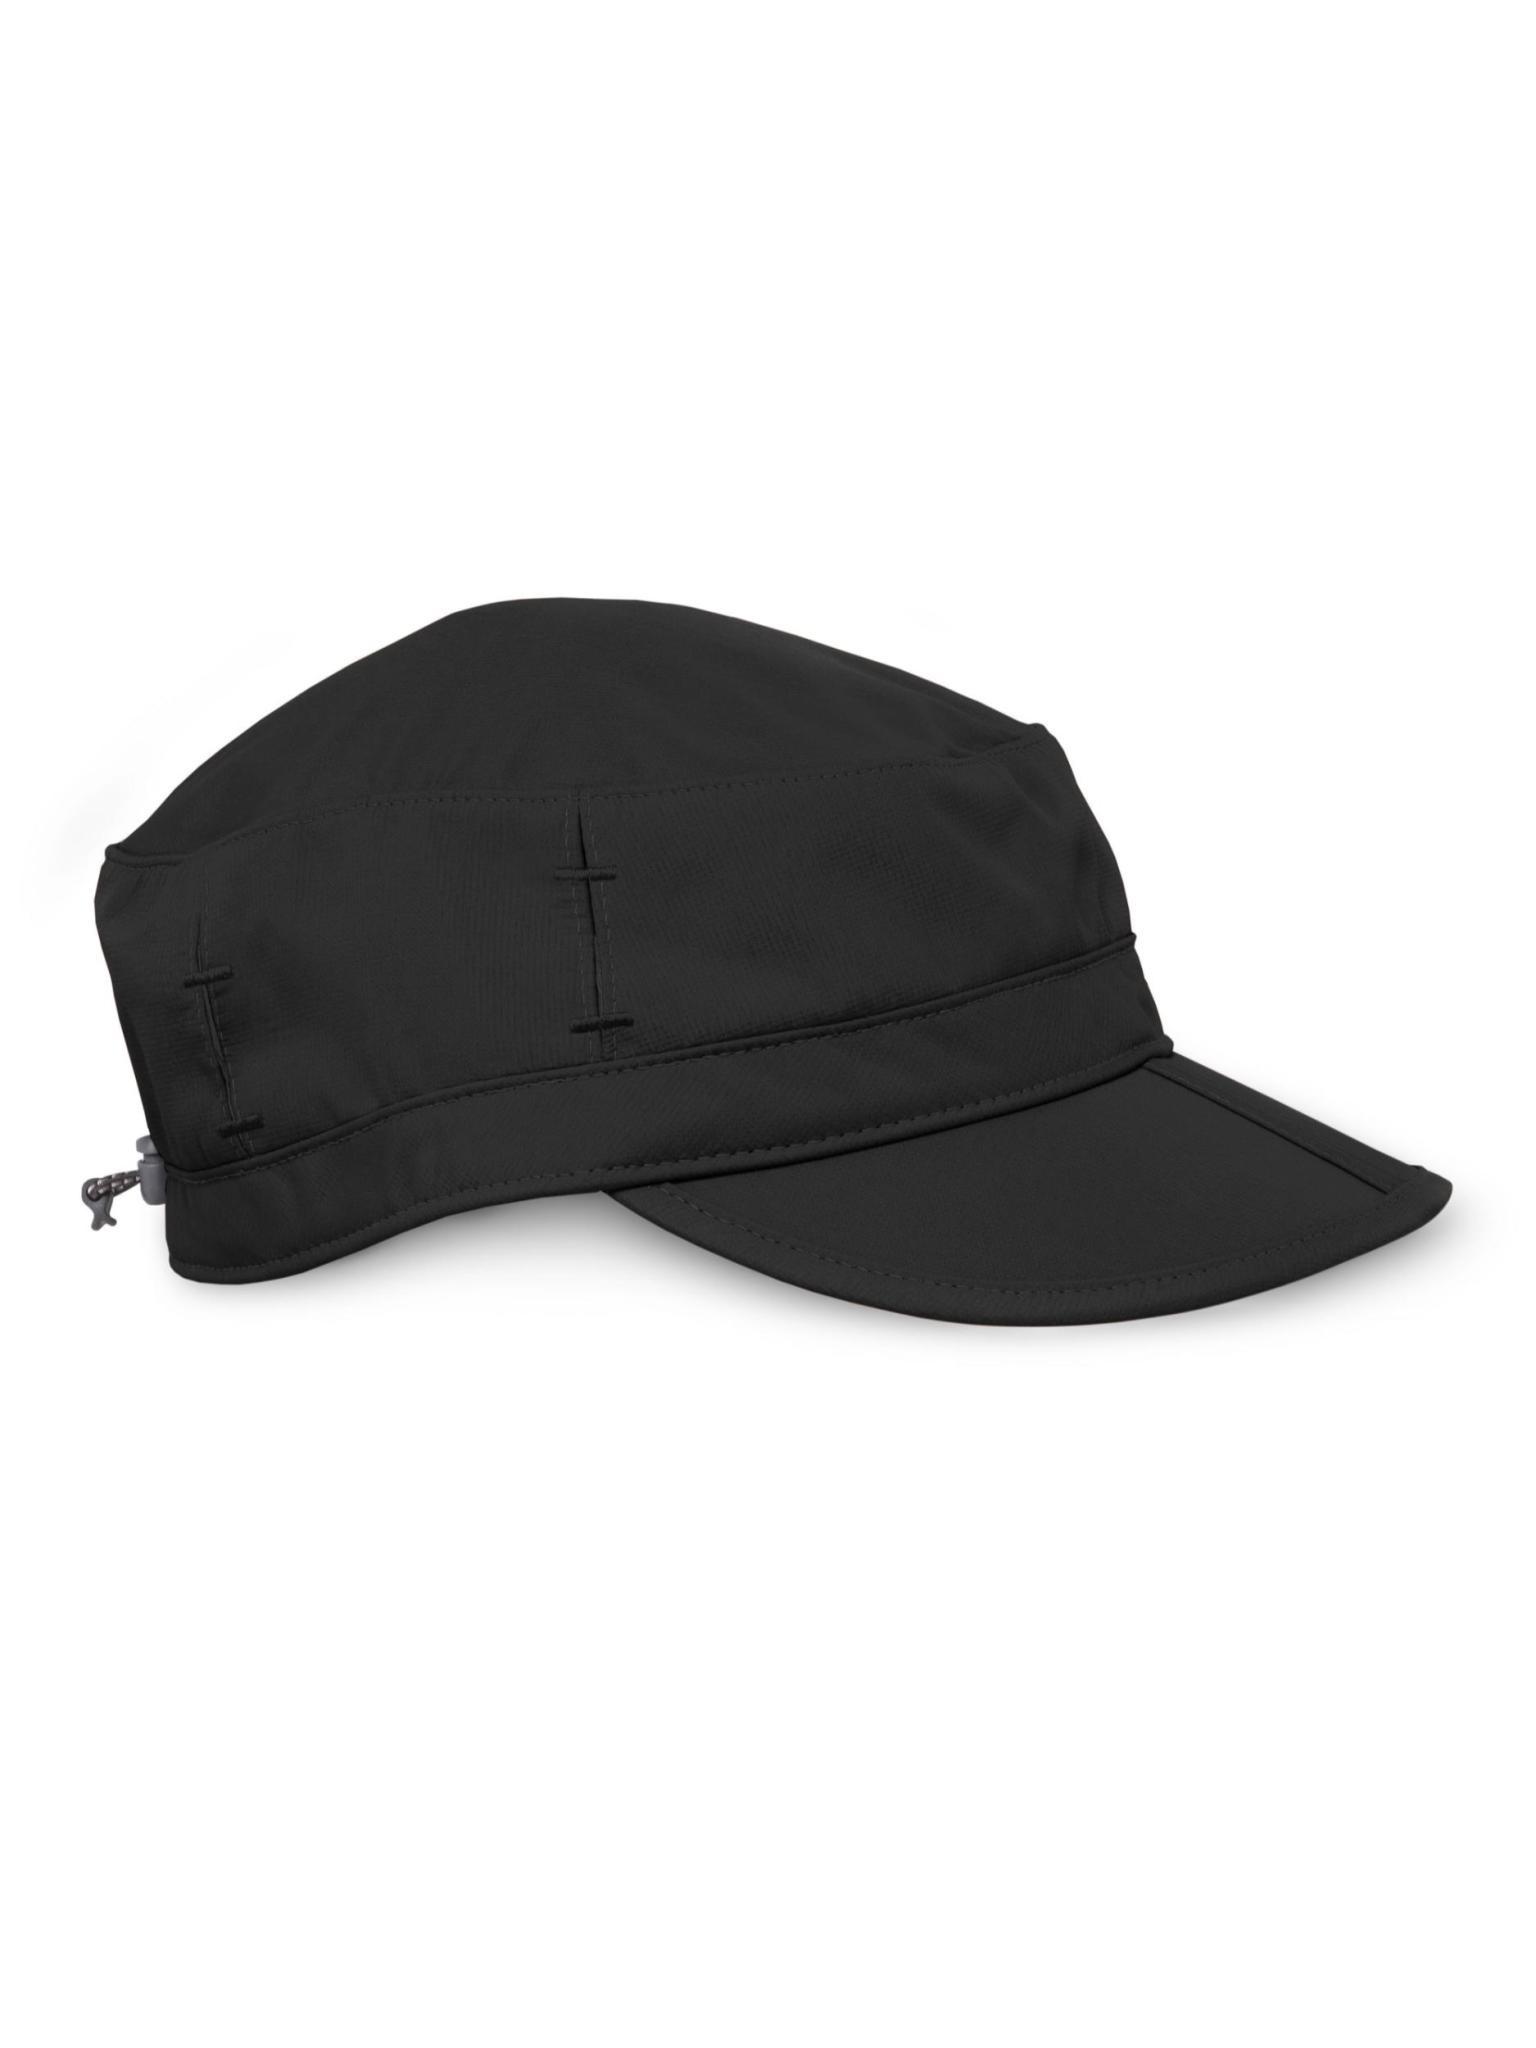 Sunday Afternoons Sun Tripper Cap Black